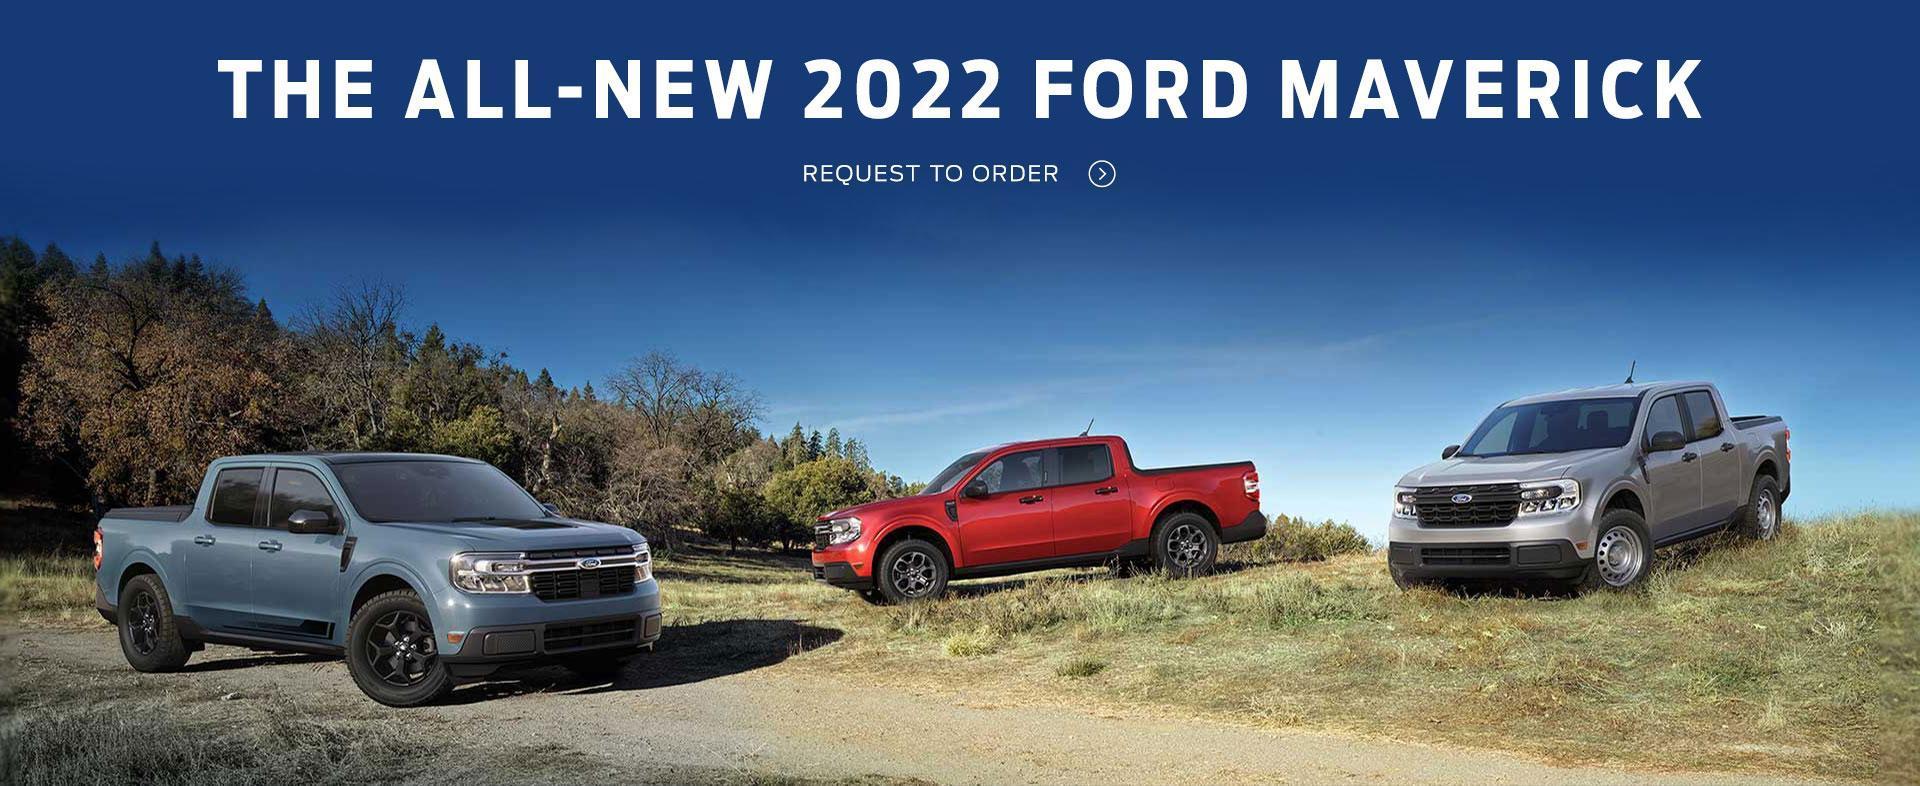 22022 Ford Maverick